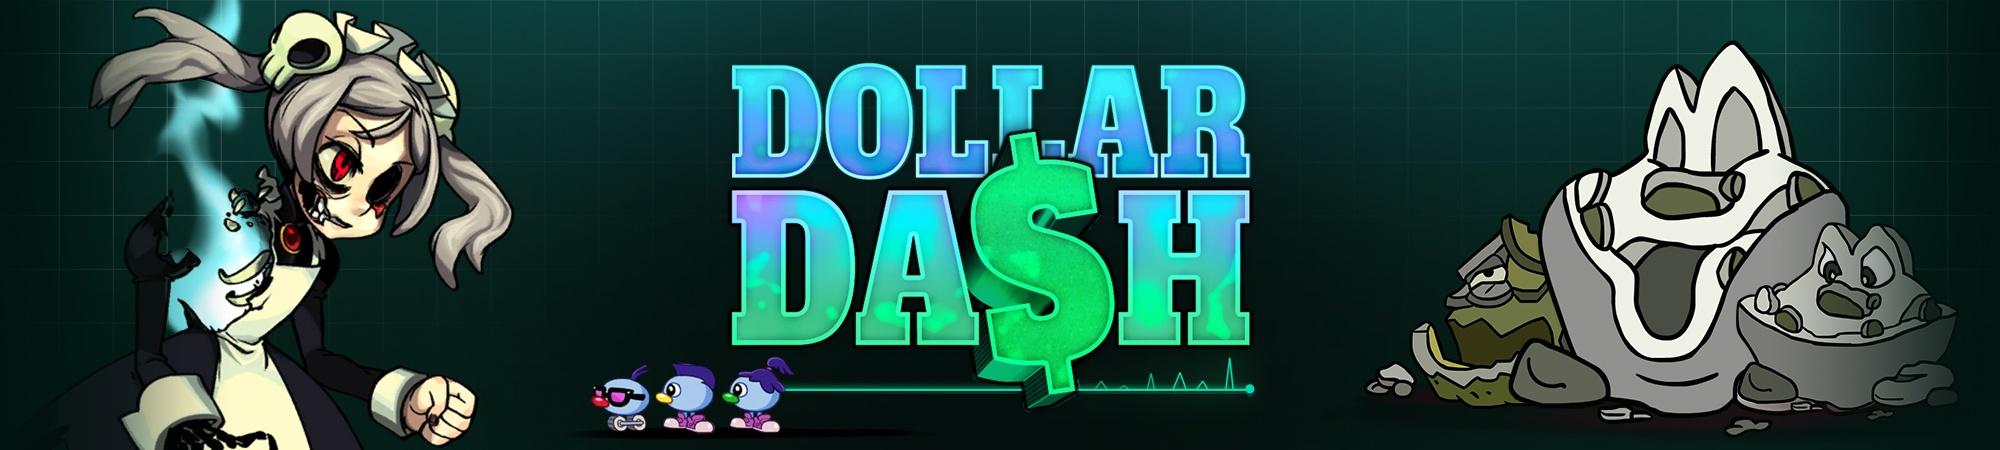 Dollar Dash 5 (Skullgirls, Lucius, Postal etc.) from 1 for $1.00 @ Bundle Stars